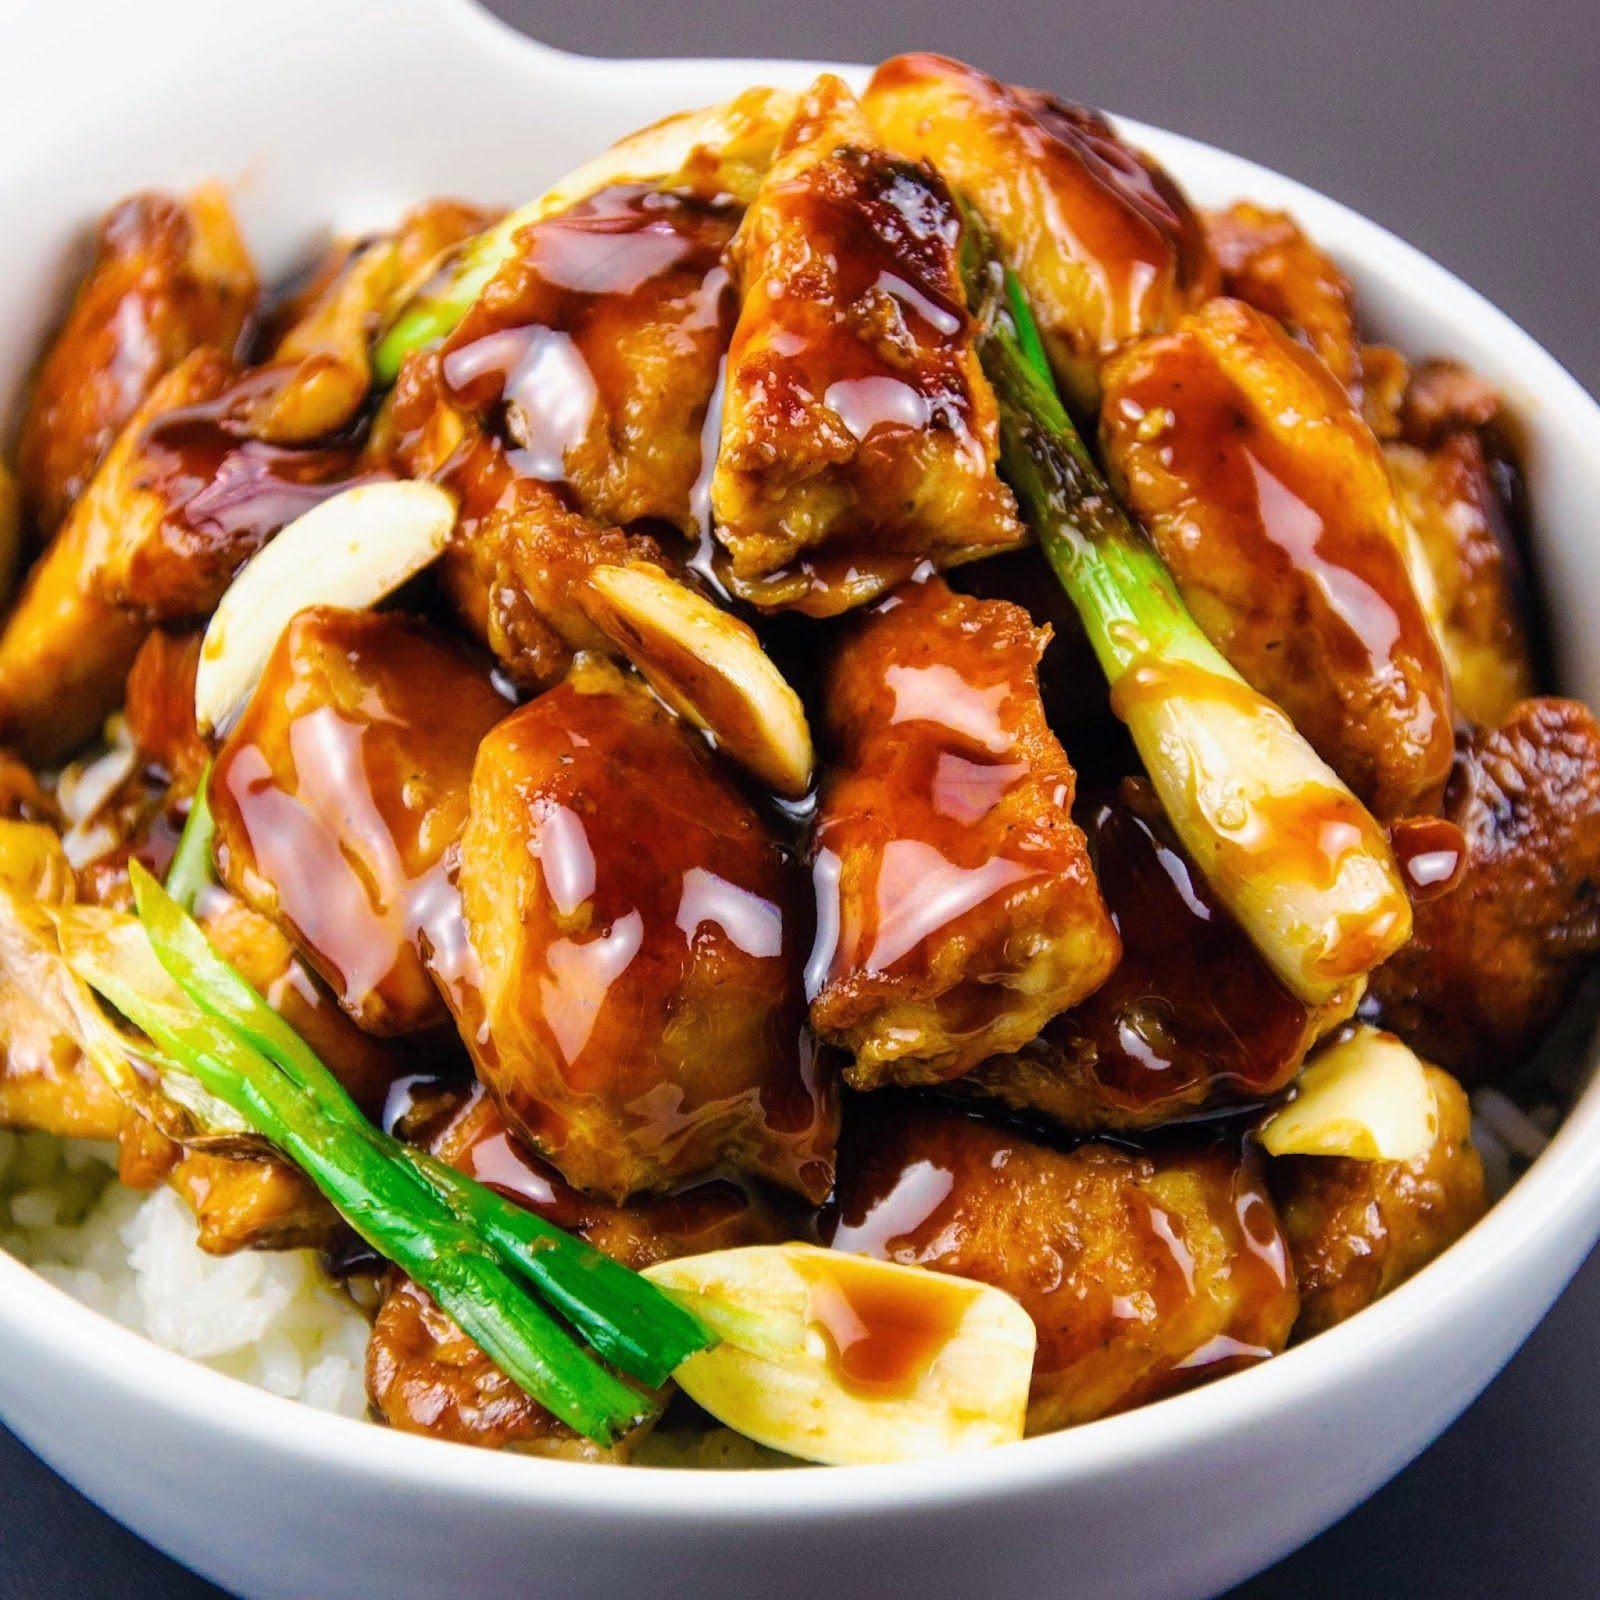 Diabetic Chicken Recipes Diabetic Recipes for Dinner Diabetic Dinner Recipes